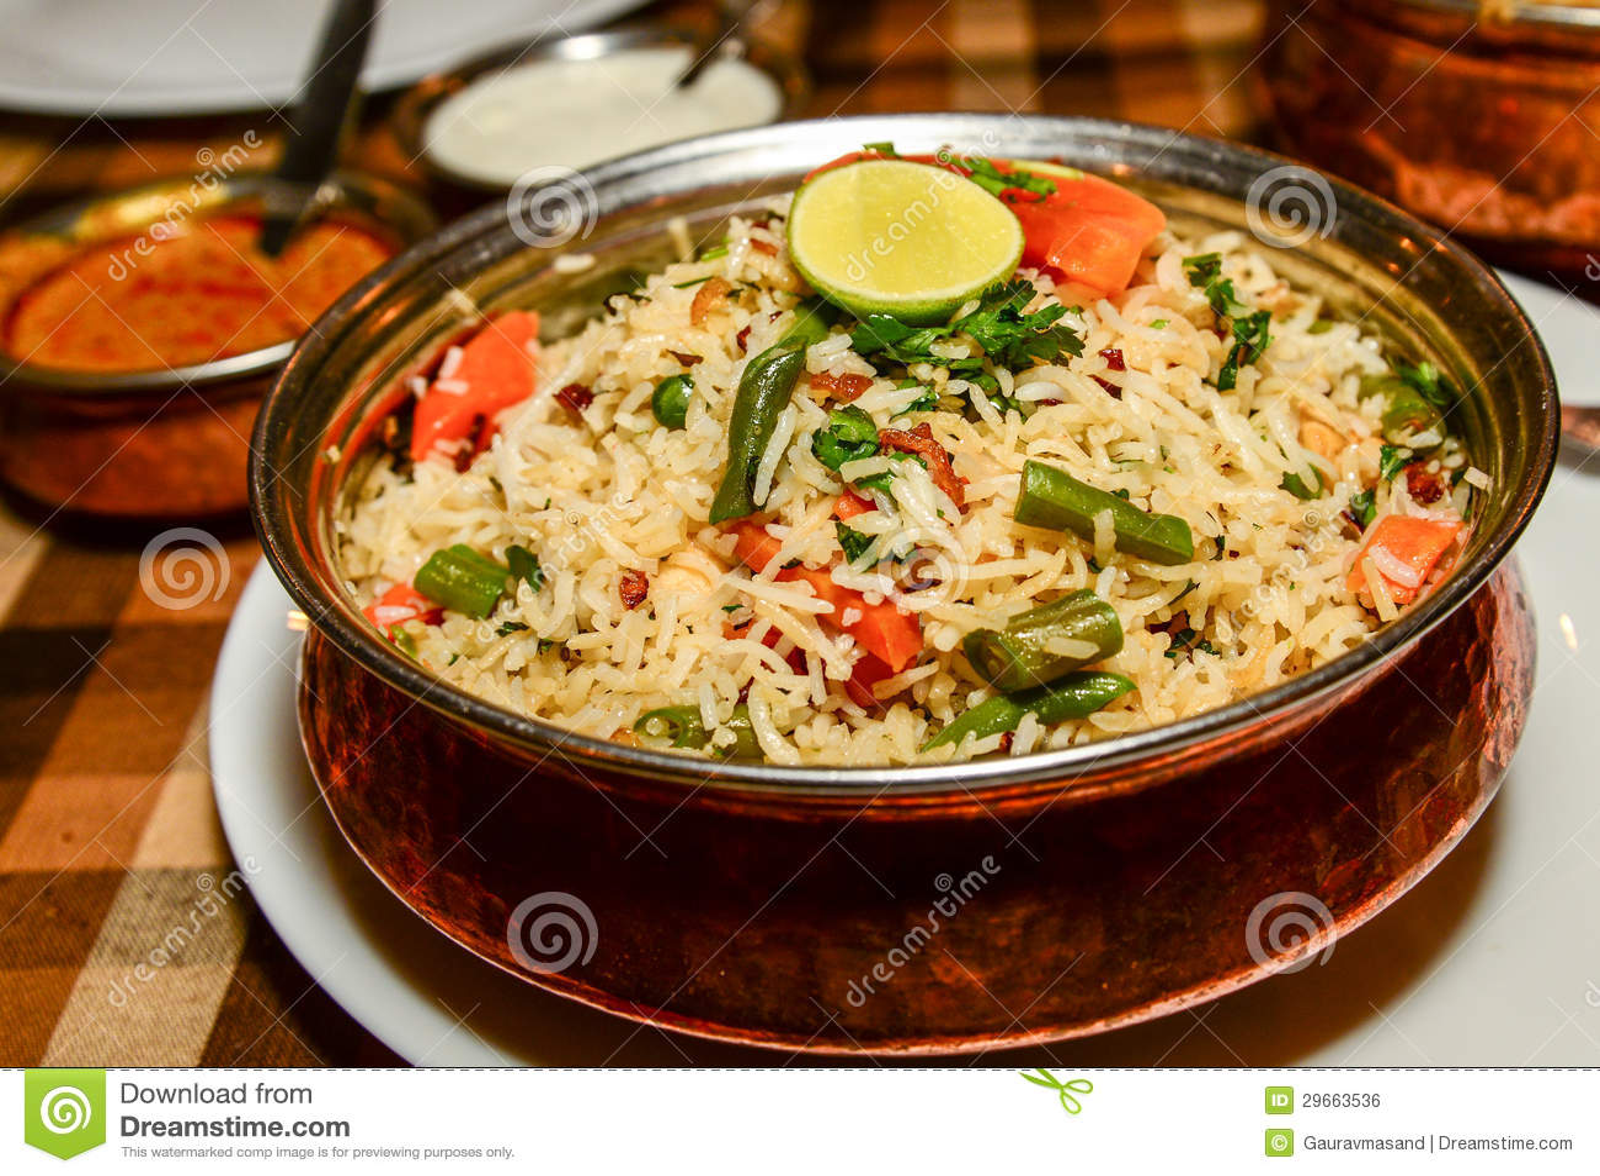 Free stock photo of biryani, biryani rice, food.